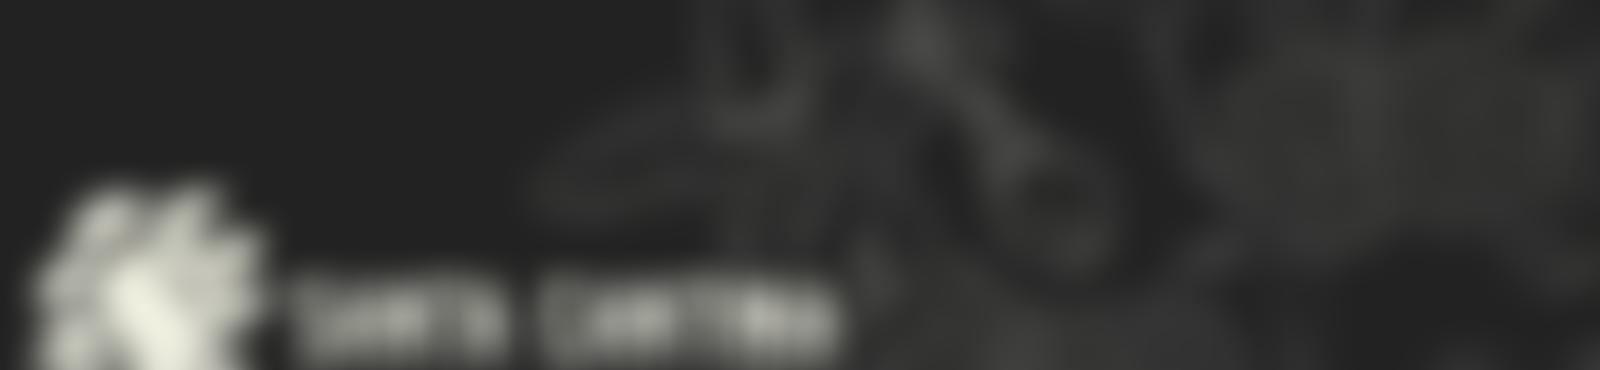 Blurred 74e960d7 2783 43f3 bc25 255c5bdc8777